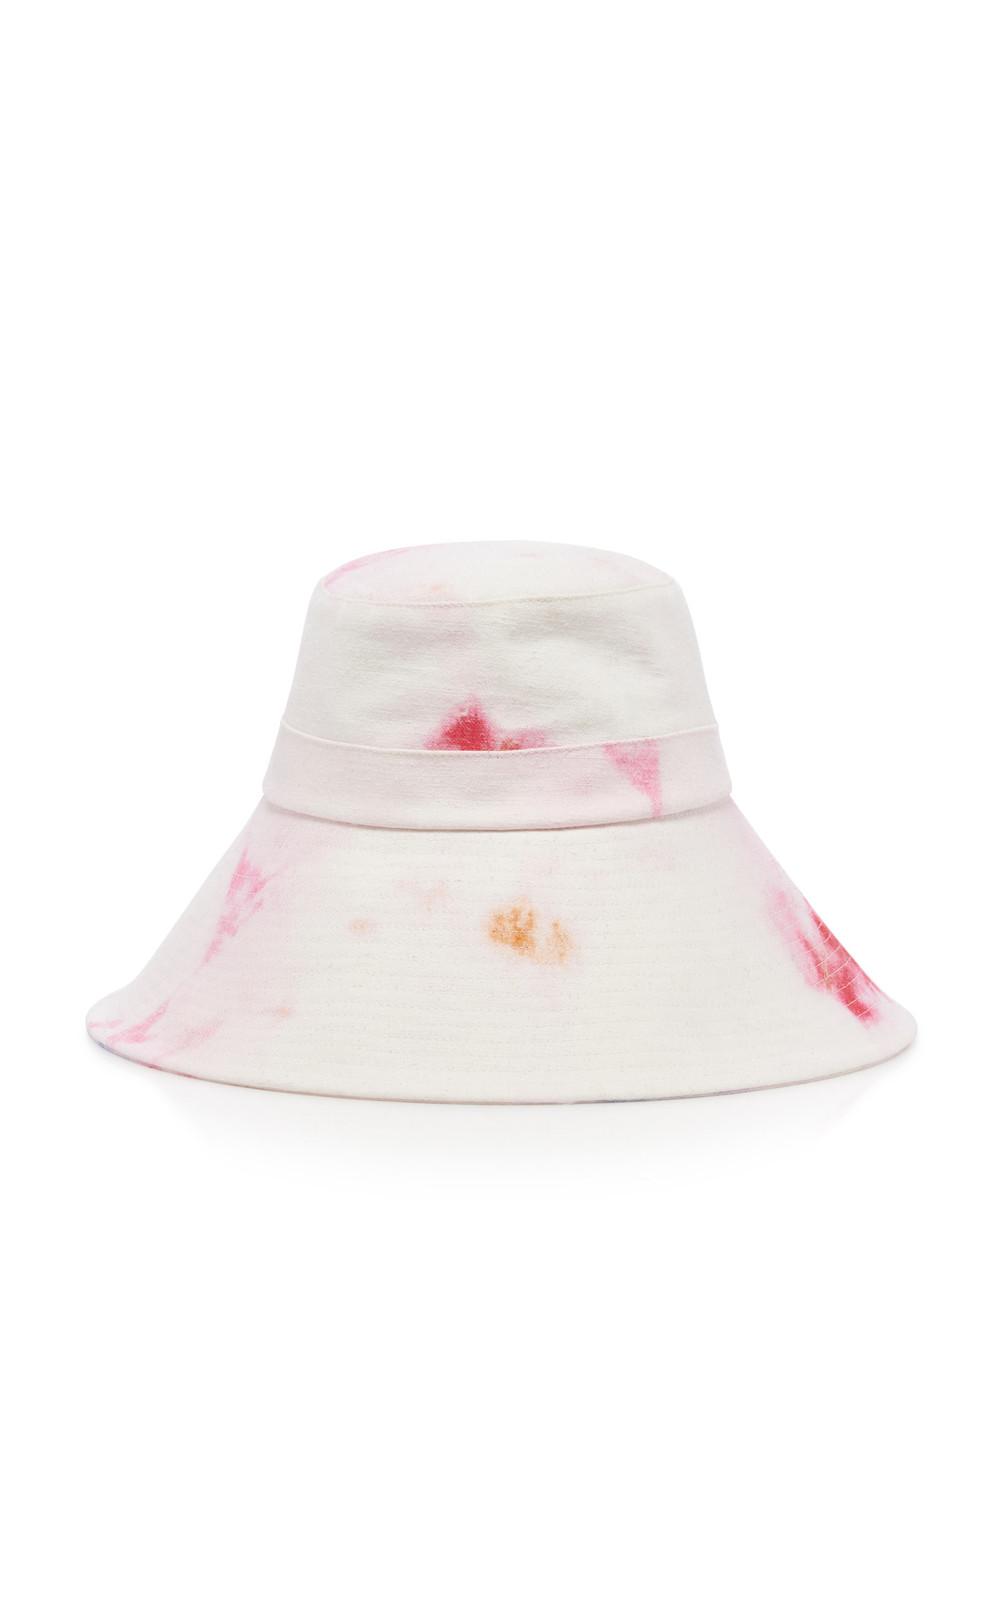 Isabel Marant Noliae Tie-Dye Cotton Bucket Hat Size: 57 in pink